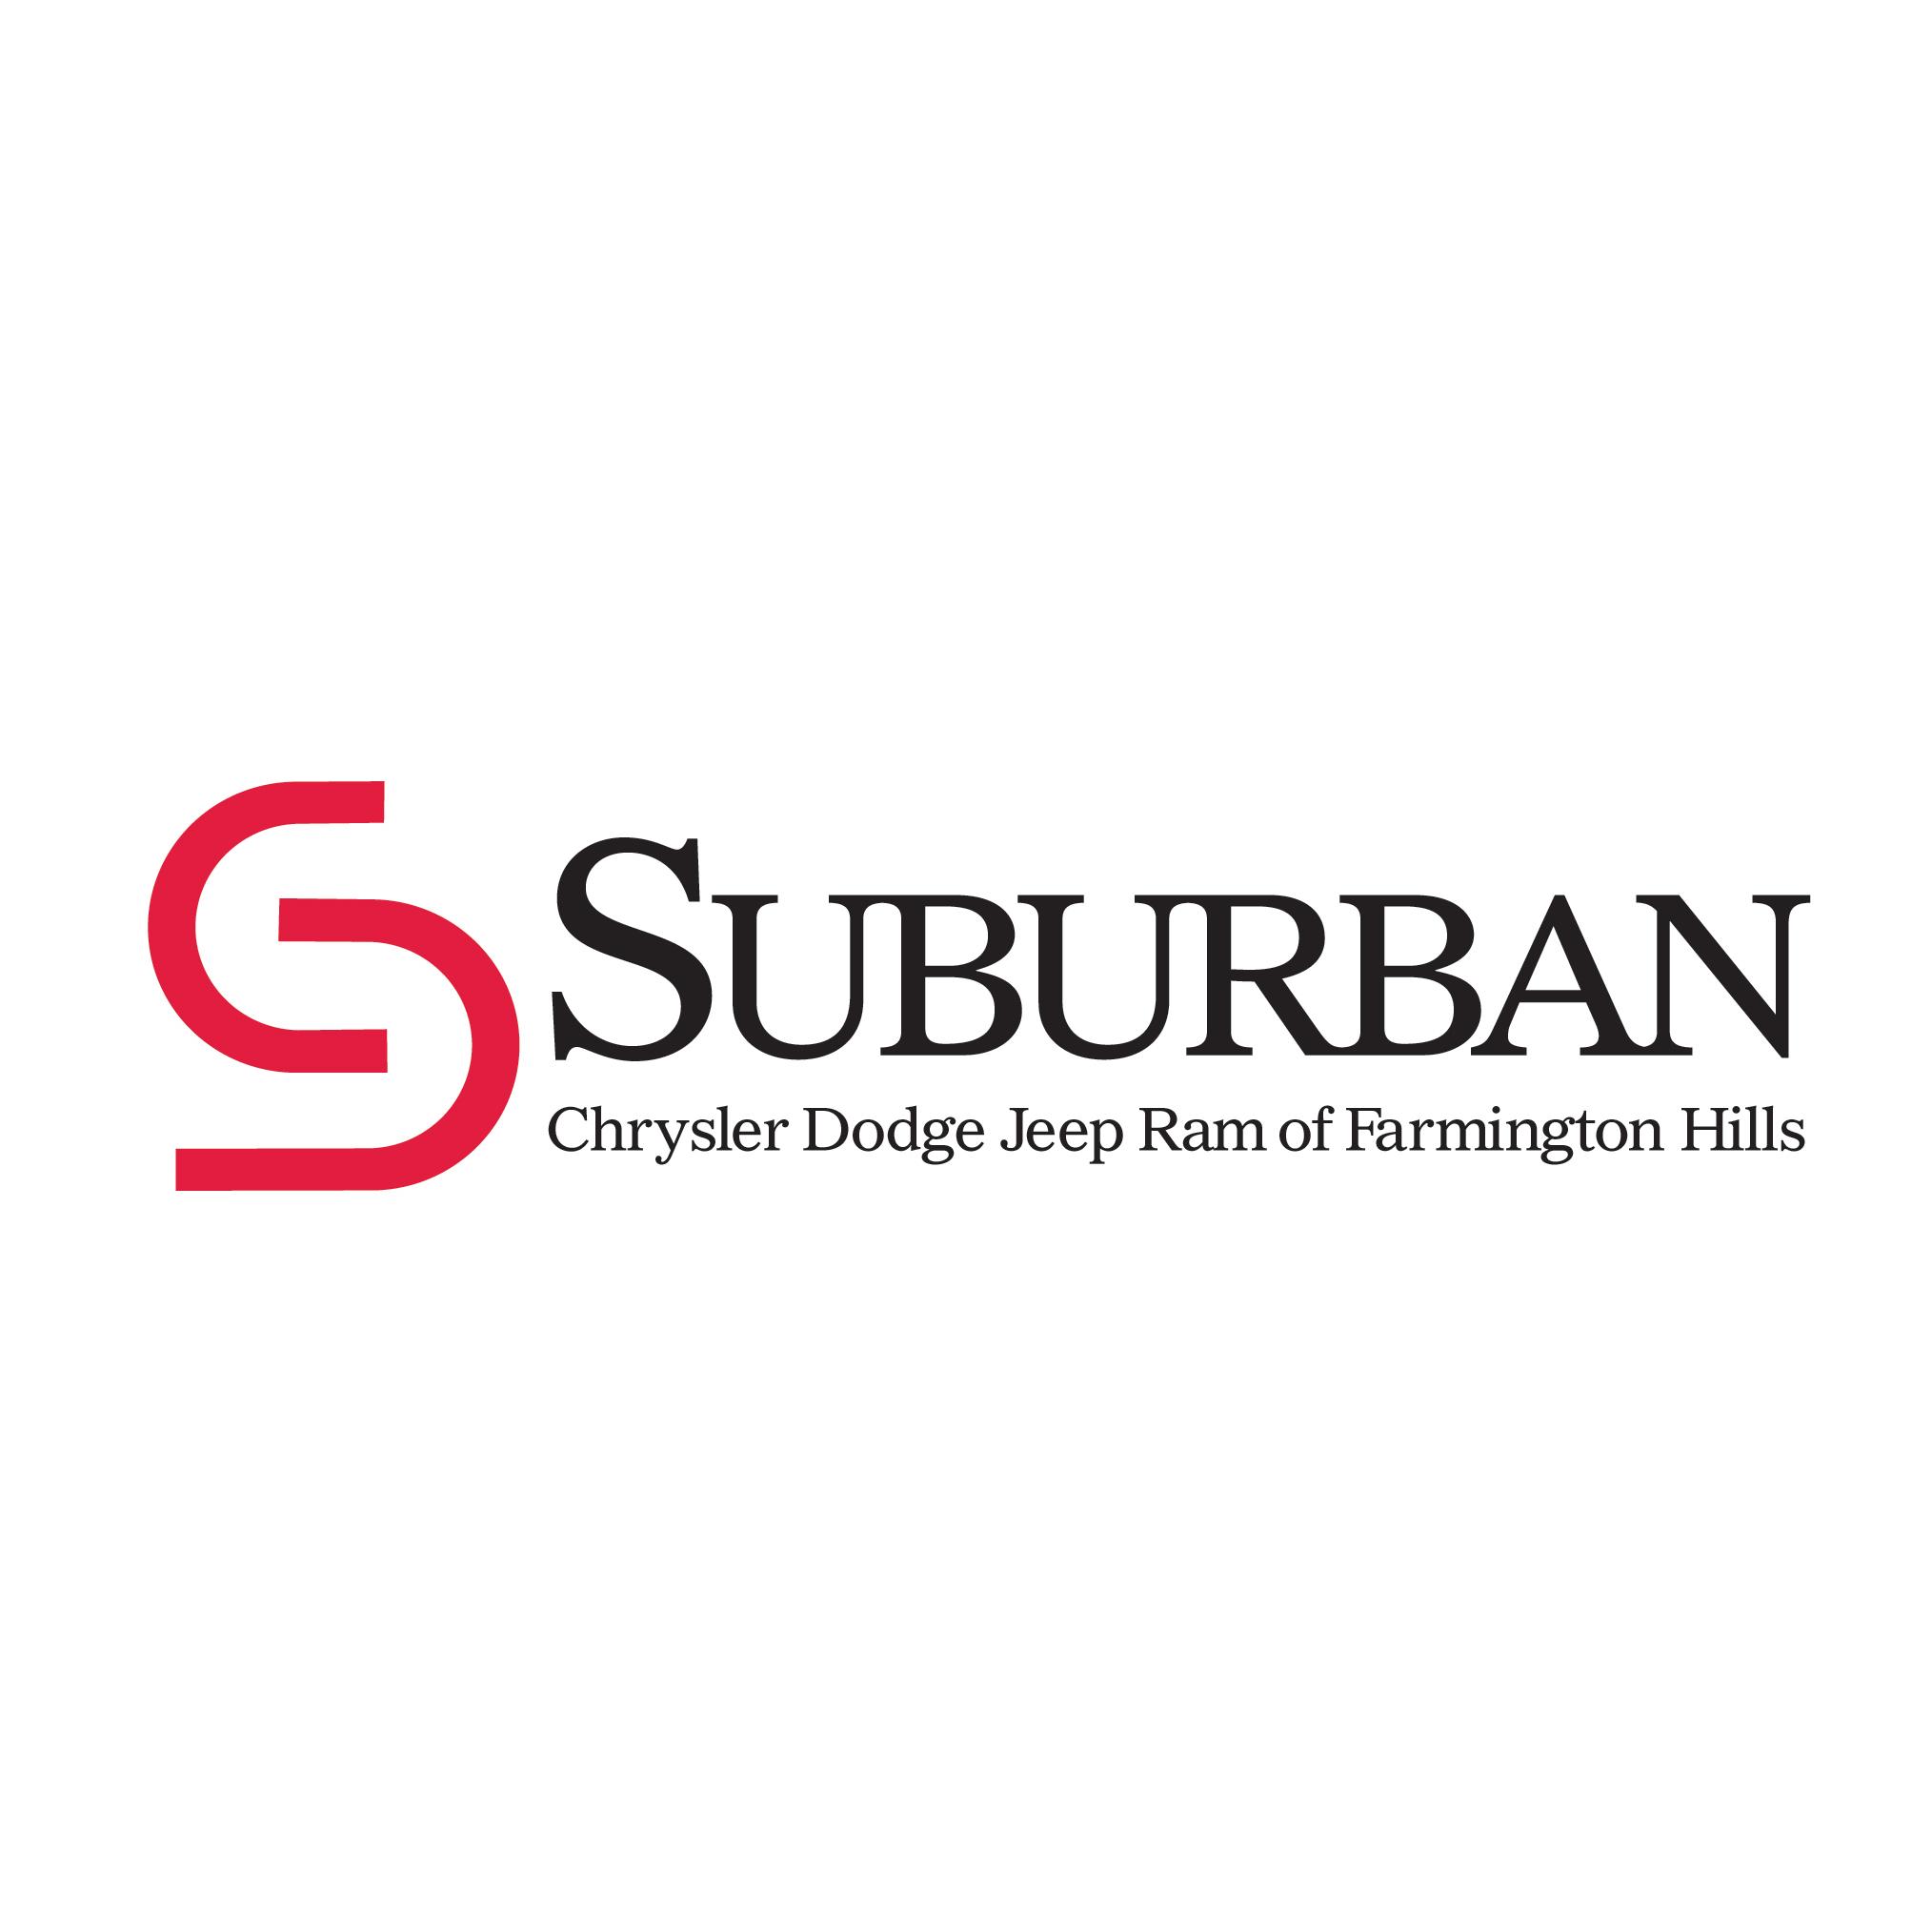 suburban chrysler dodge jeep ram of farmington hills